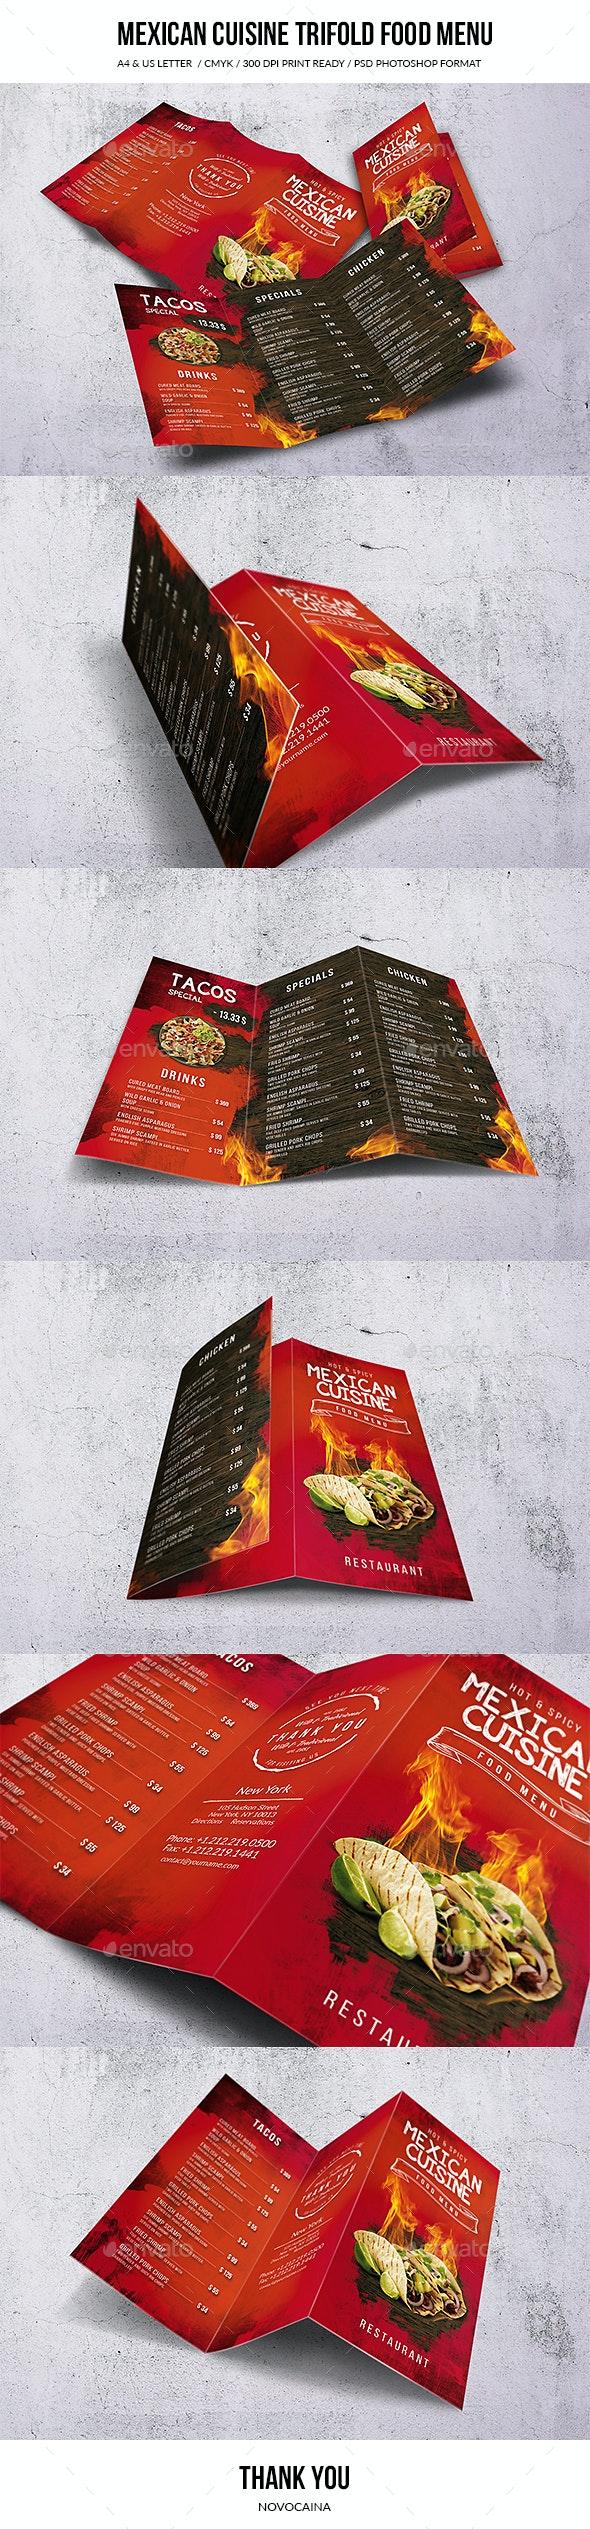 Mexican Cuisine A4 & US Letter Trifold Food Menu - Food Menus Print Templates